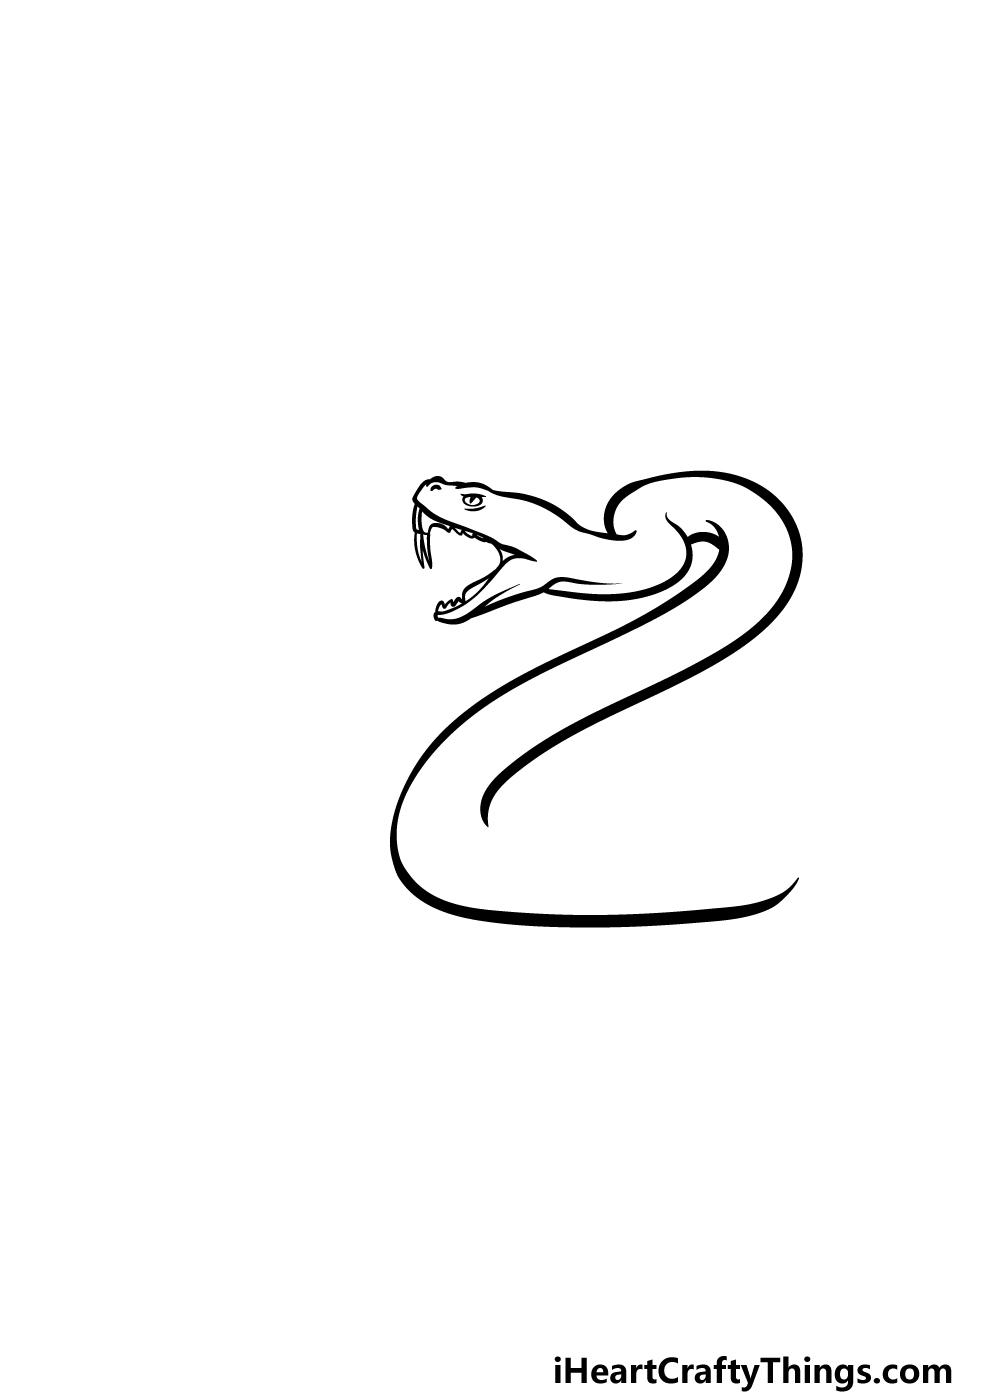 drawing a rattlesnake step 2